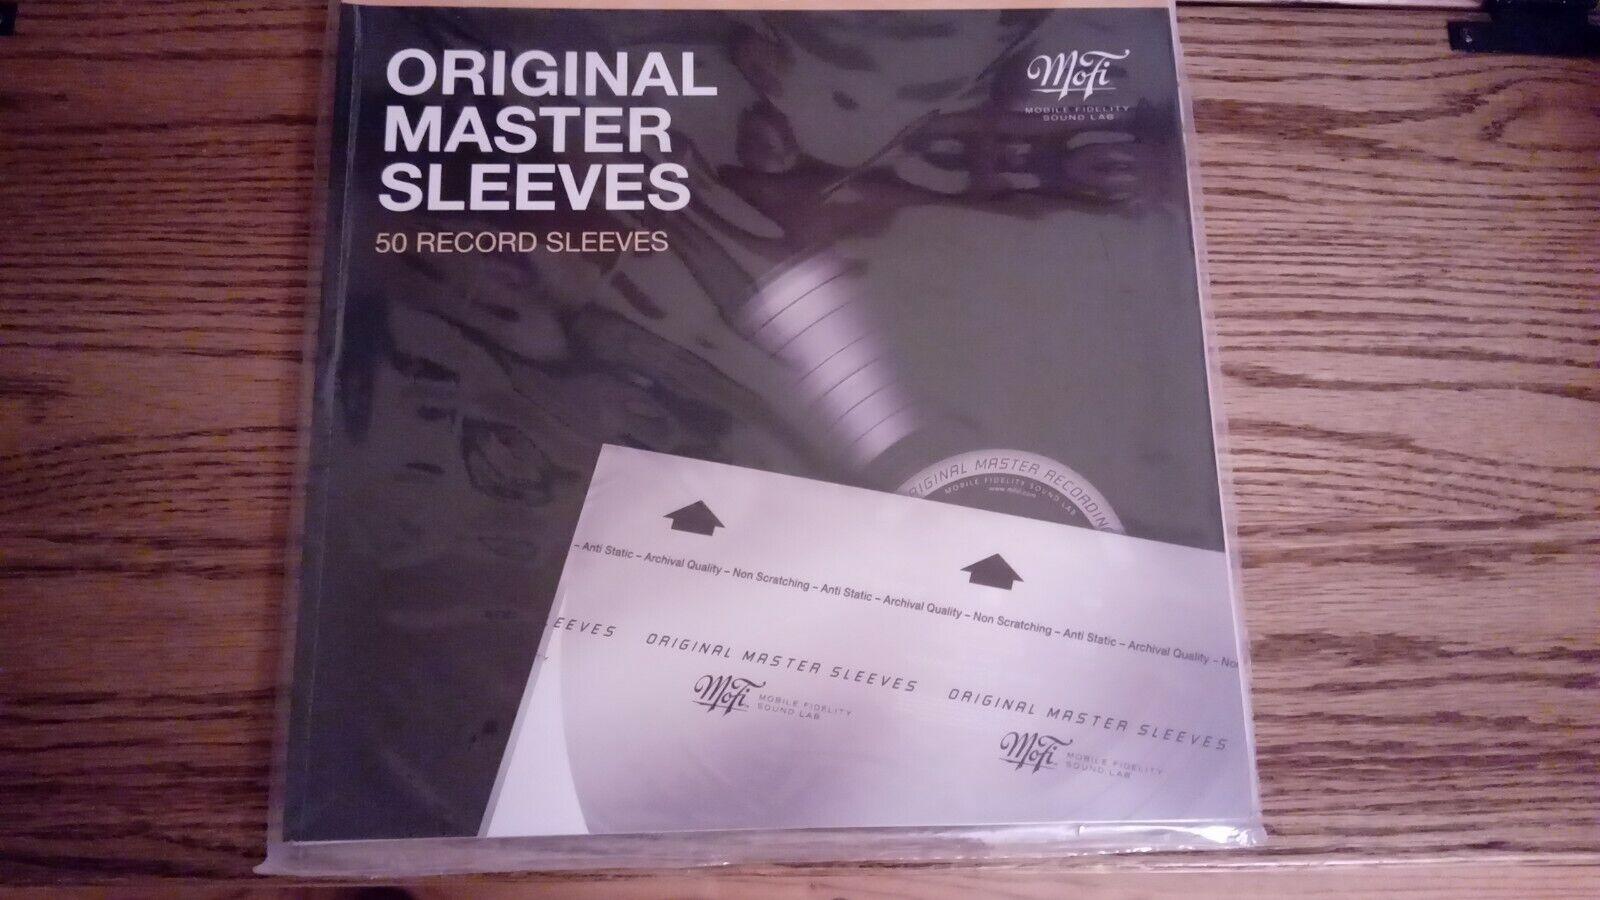 Round-Bottom Vinyl Record LP Sleeves 100 Pack Turntable Lab